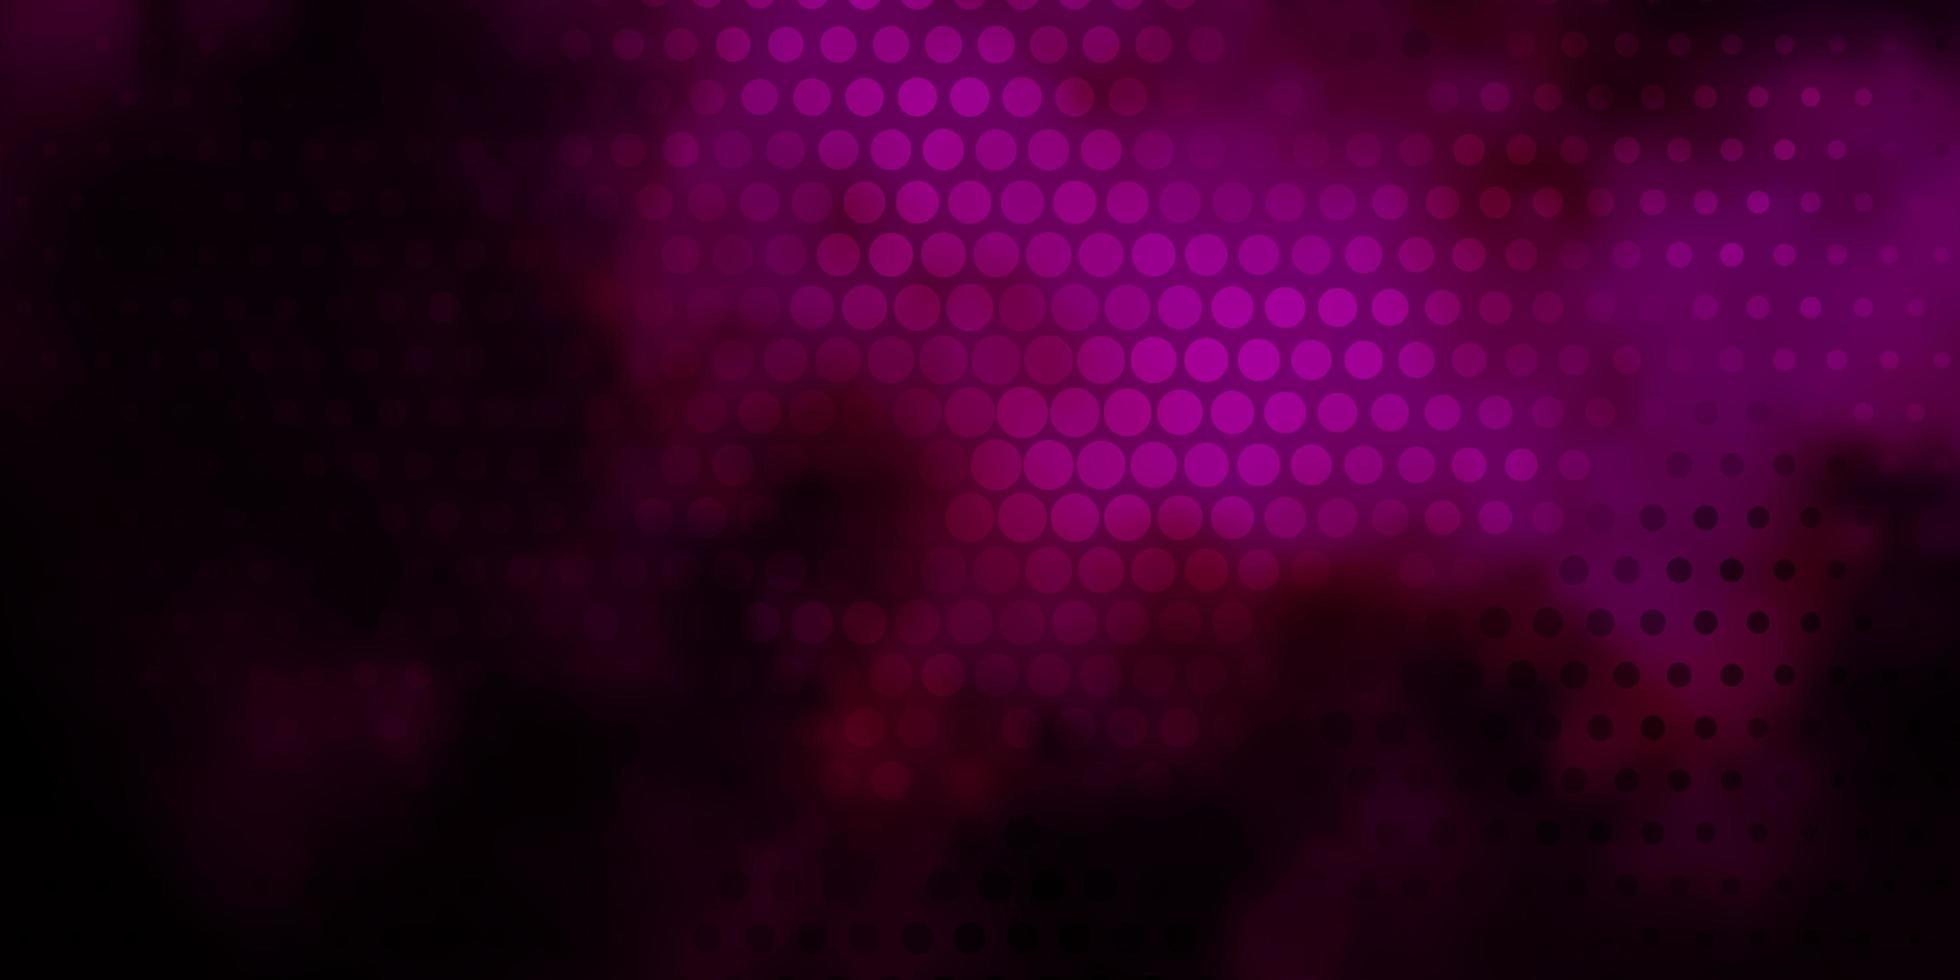 textura vector rosa escuro com discos.